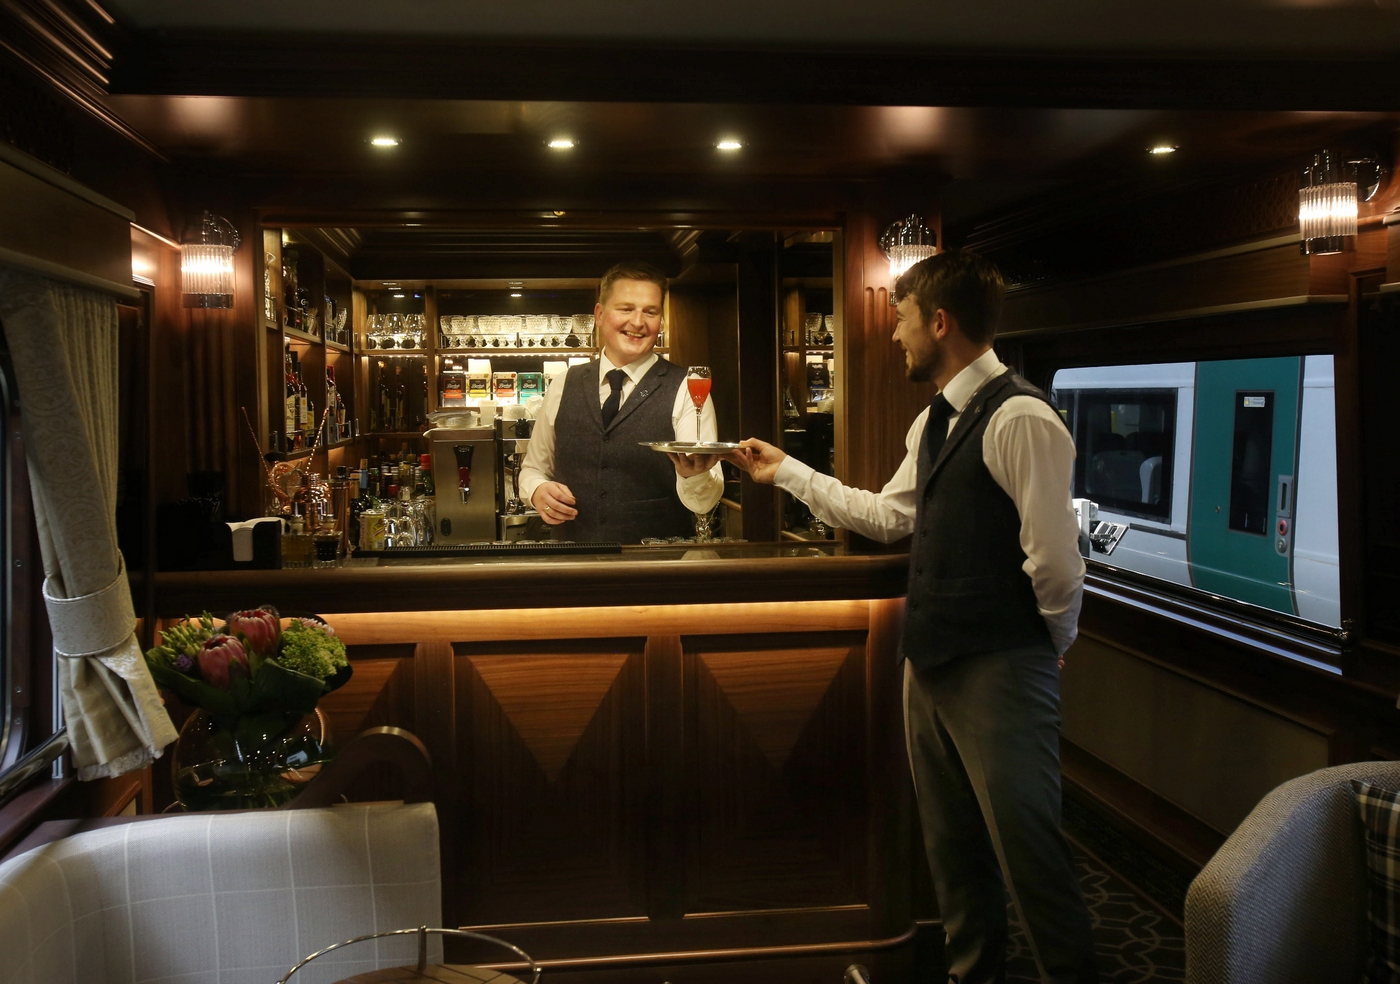 Inside Ireland S First Luxury Train The Belmond Grand